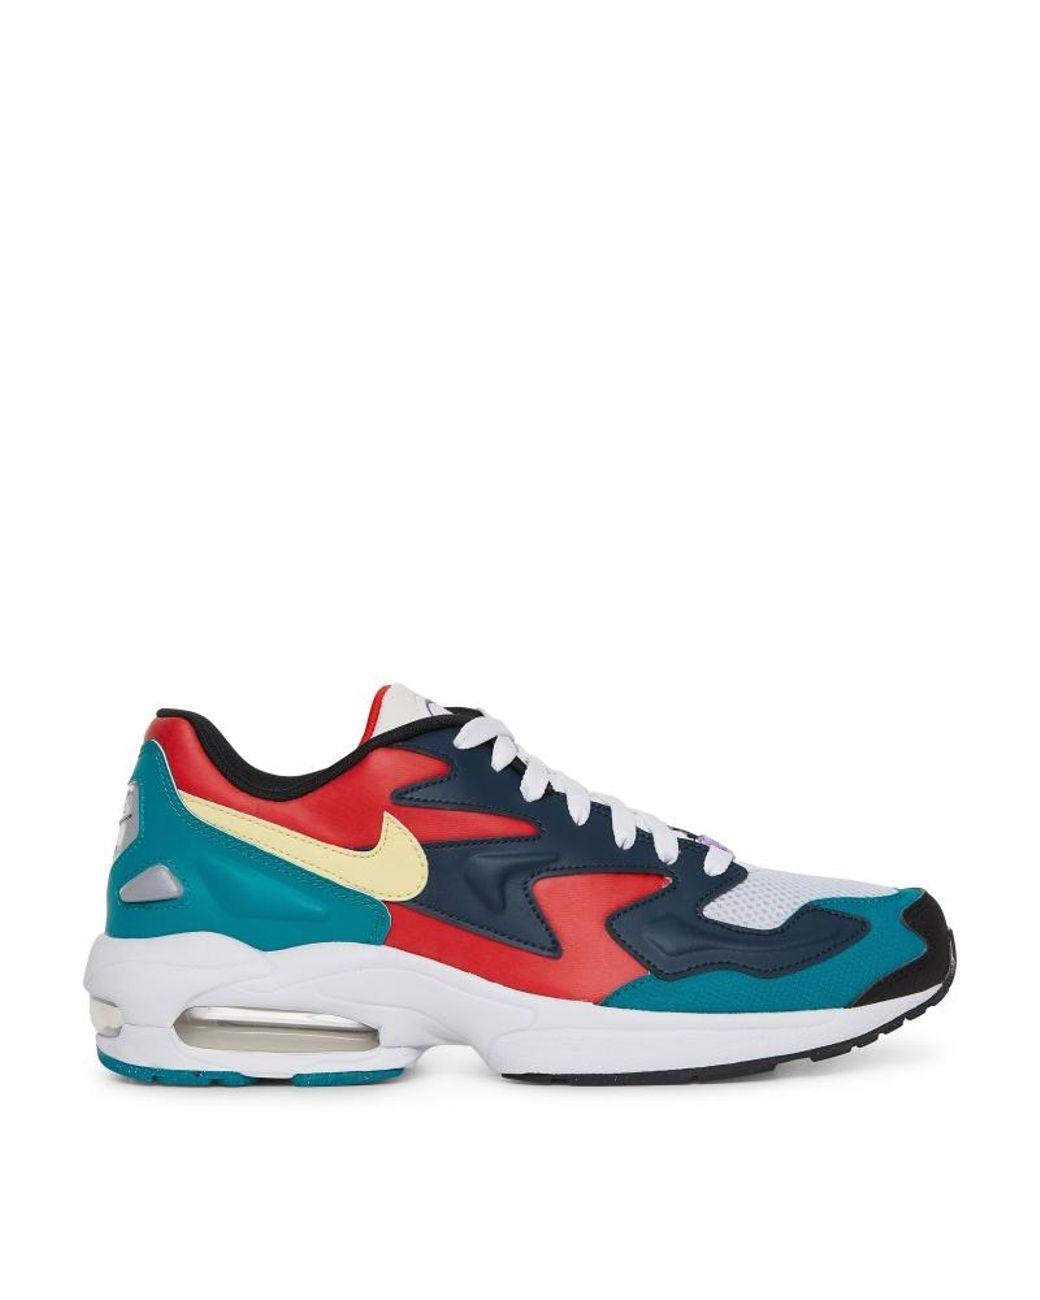 21cd17fa Nike Air Max 2 Light Sneakers in Blue for Men - Lyst